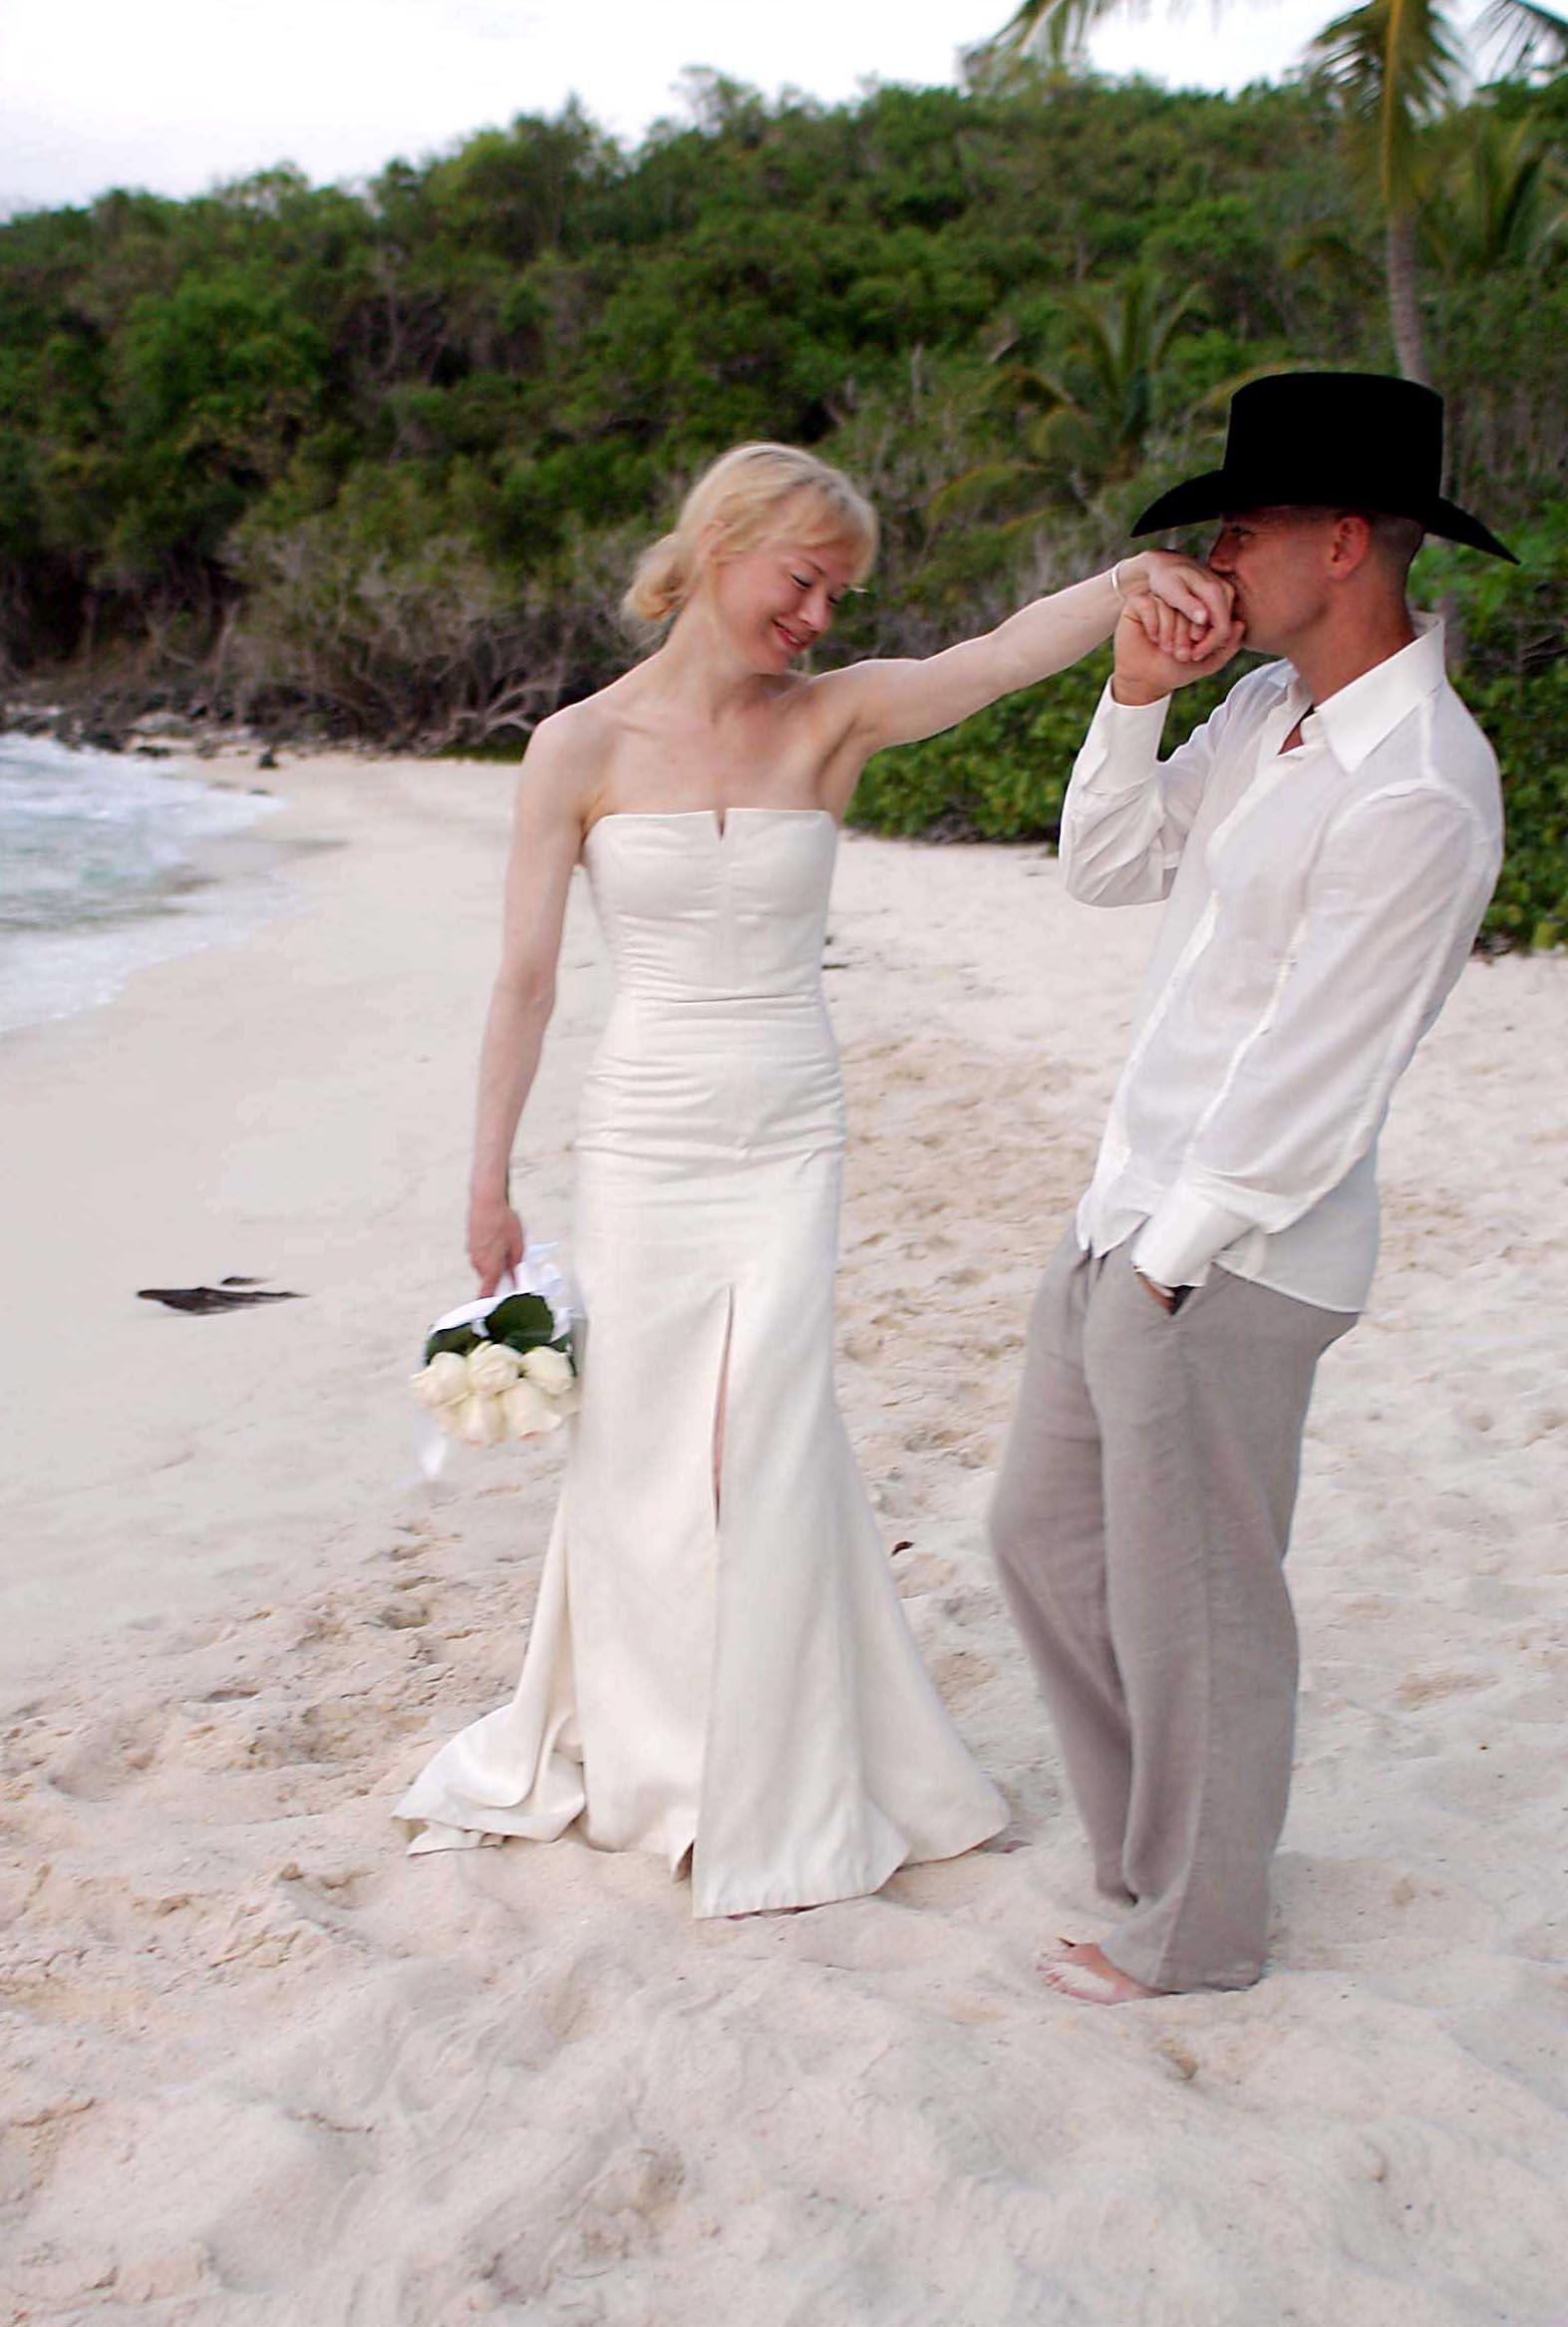 Renee Zellweger, Kenny Chesney wedding